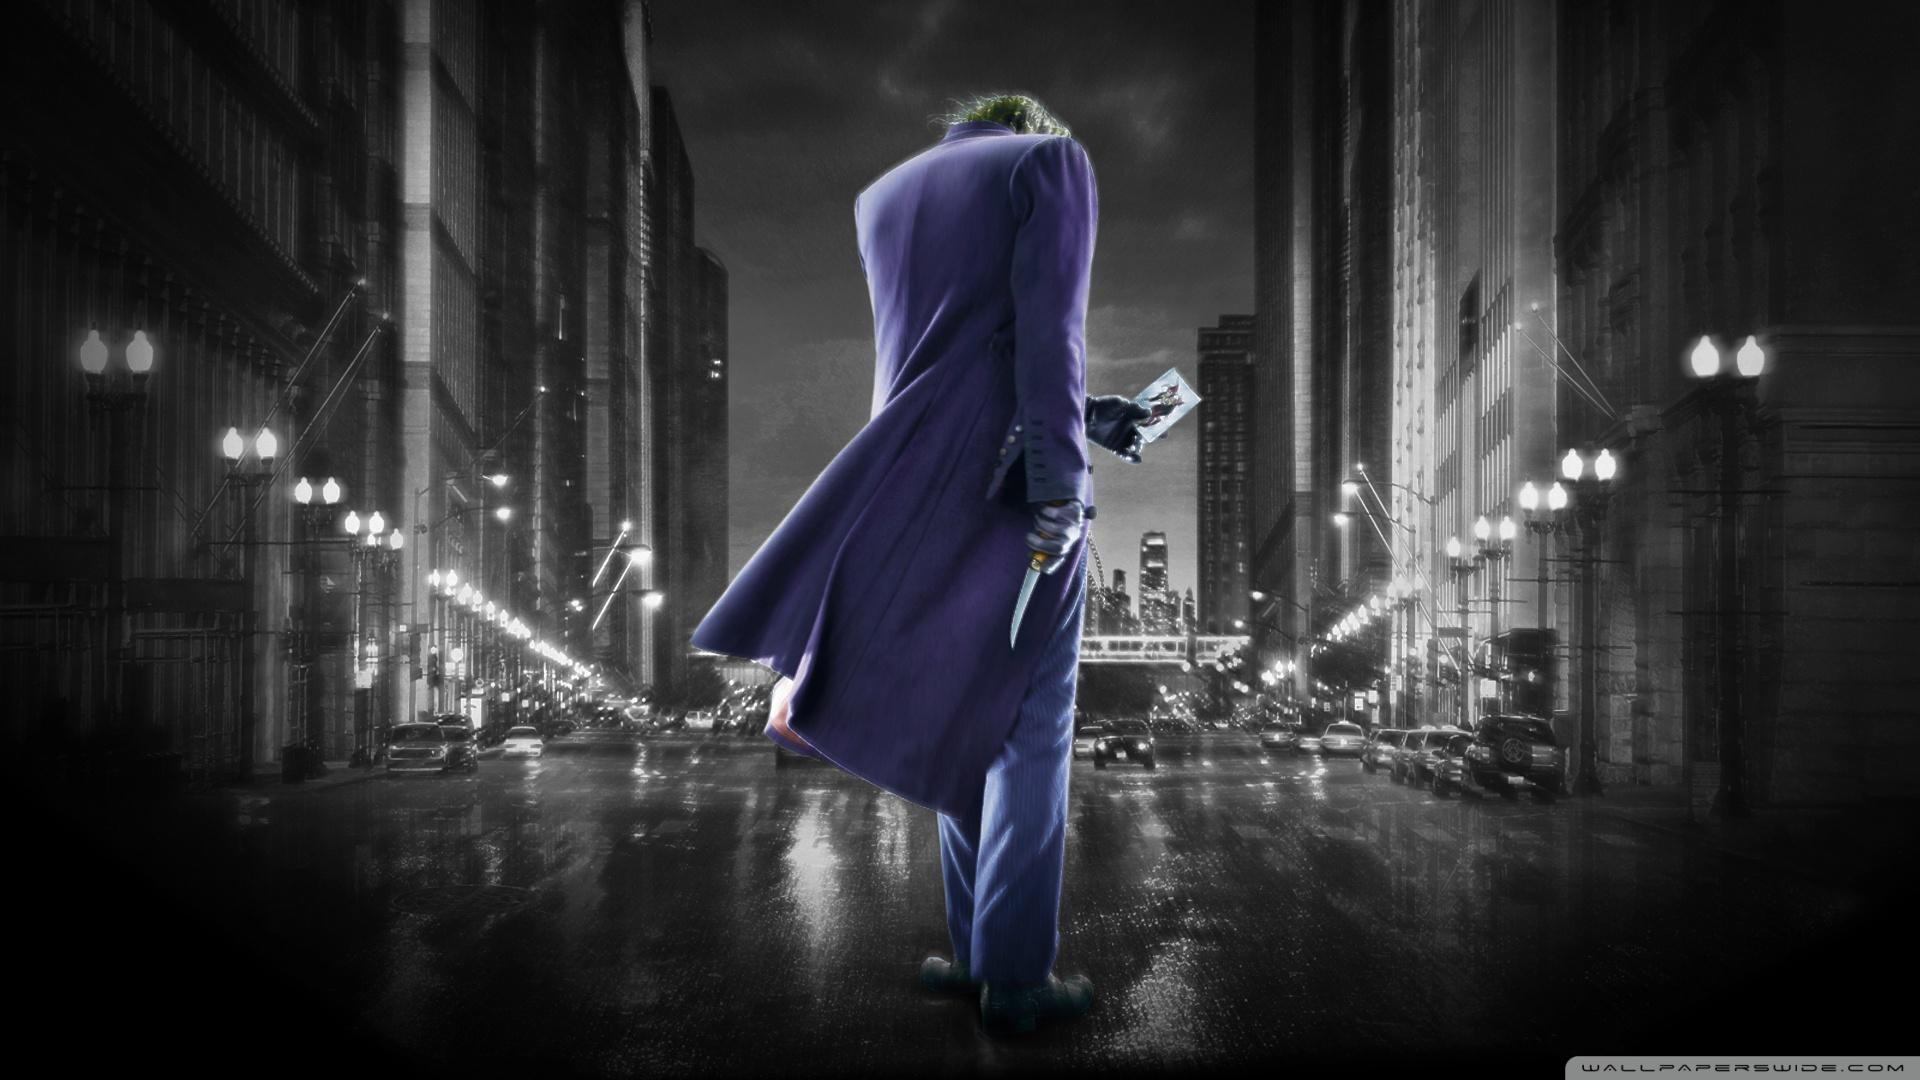 Joker 4k Hd Desktop Wallpaper For 4k Ultra Hd Tv Tablet